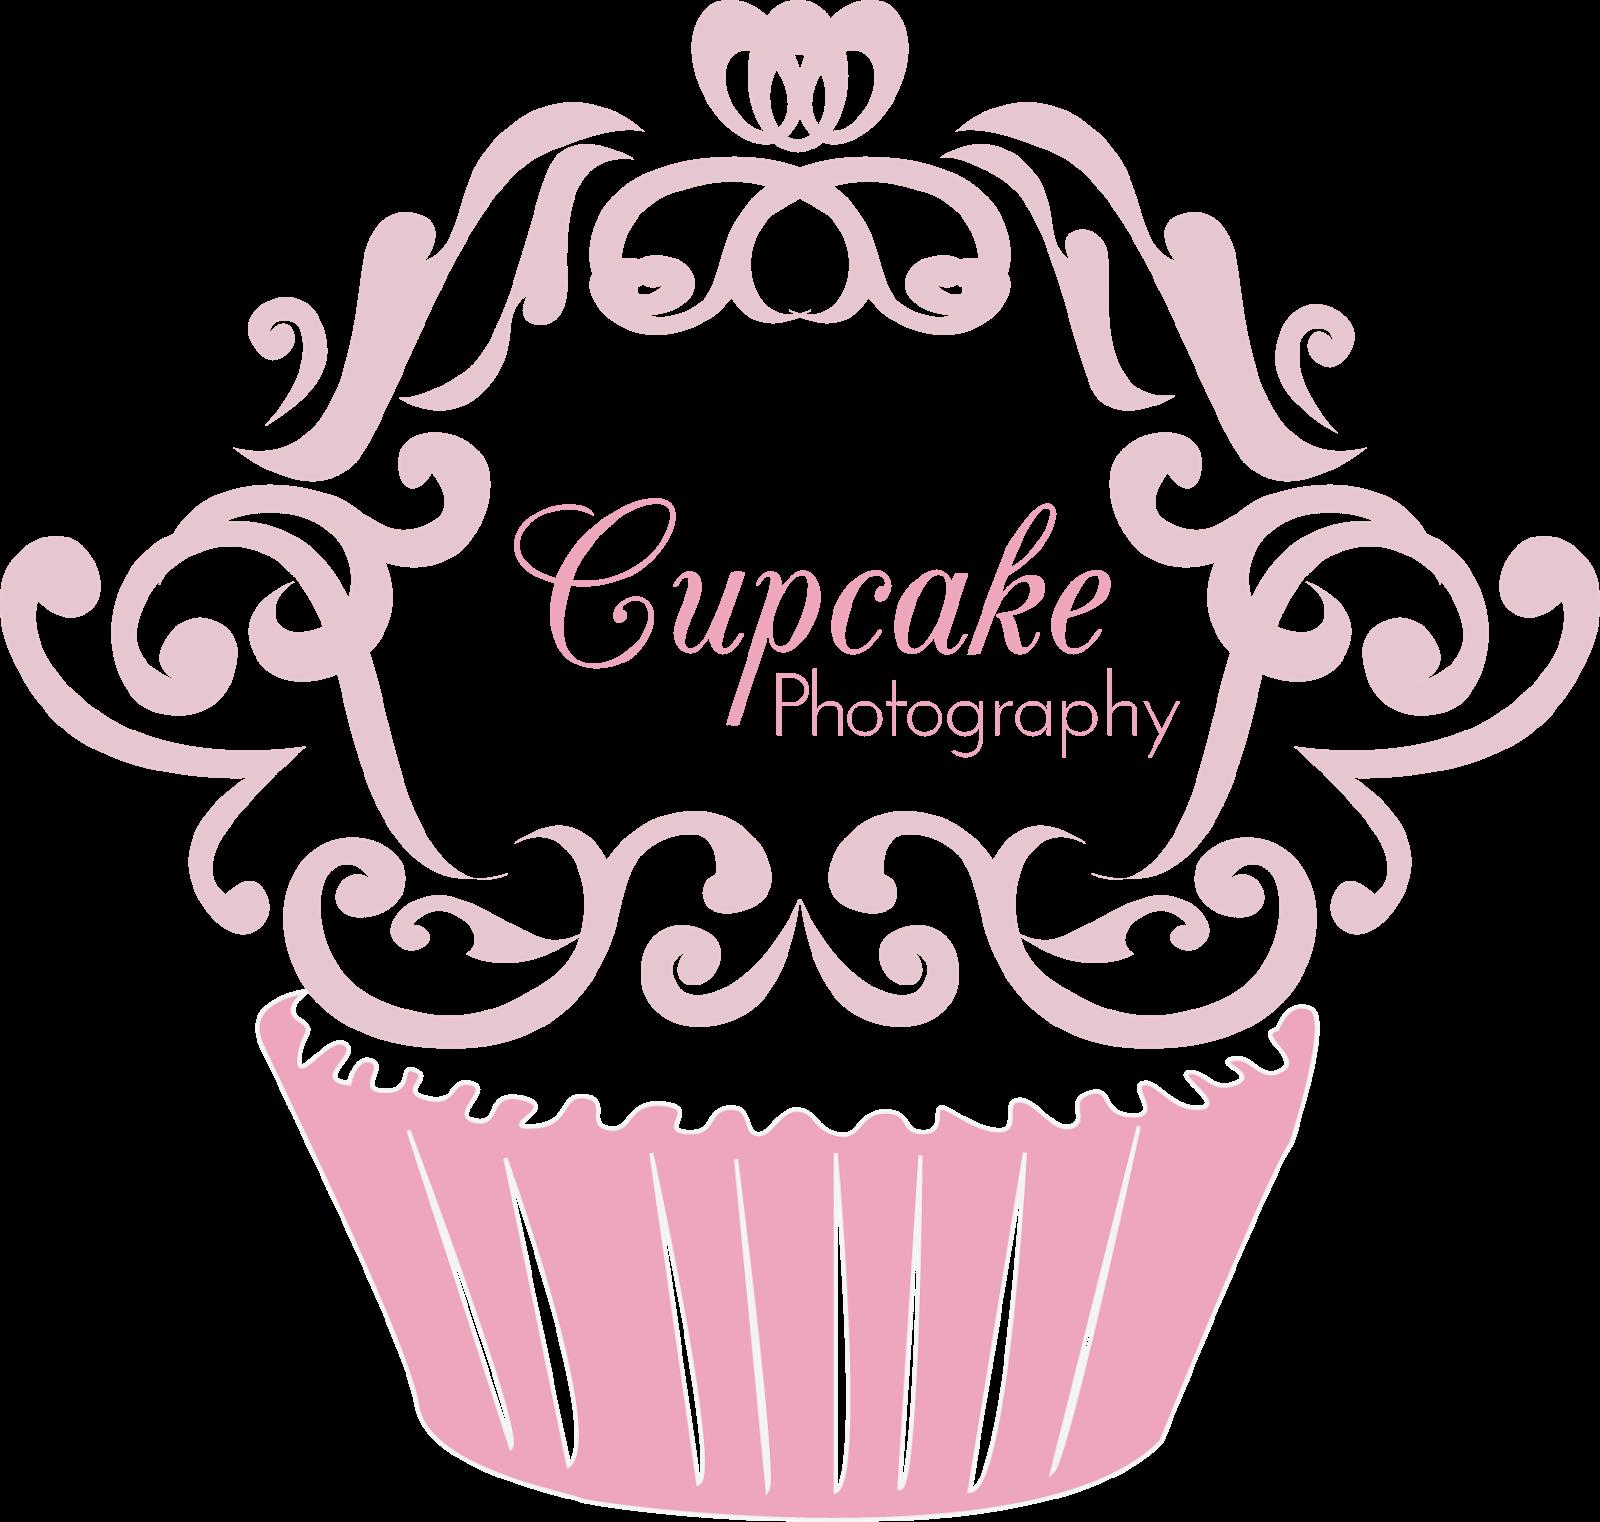 Cute Logo Ideas Cute Cupcake Logos Cute Cute Designs Cupcakes